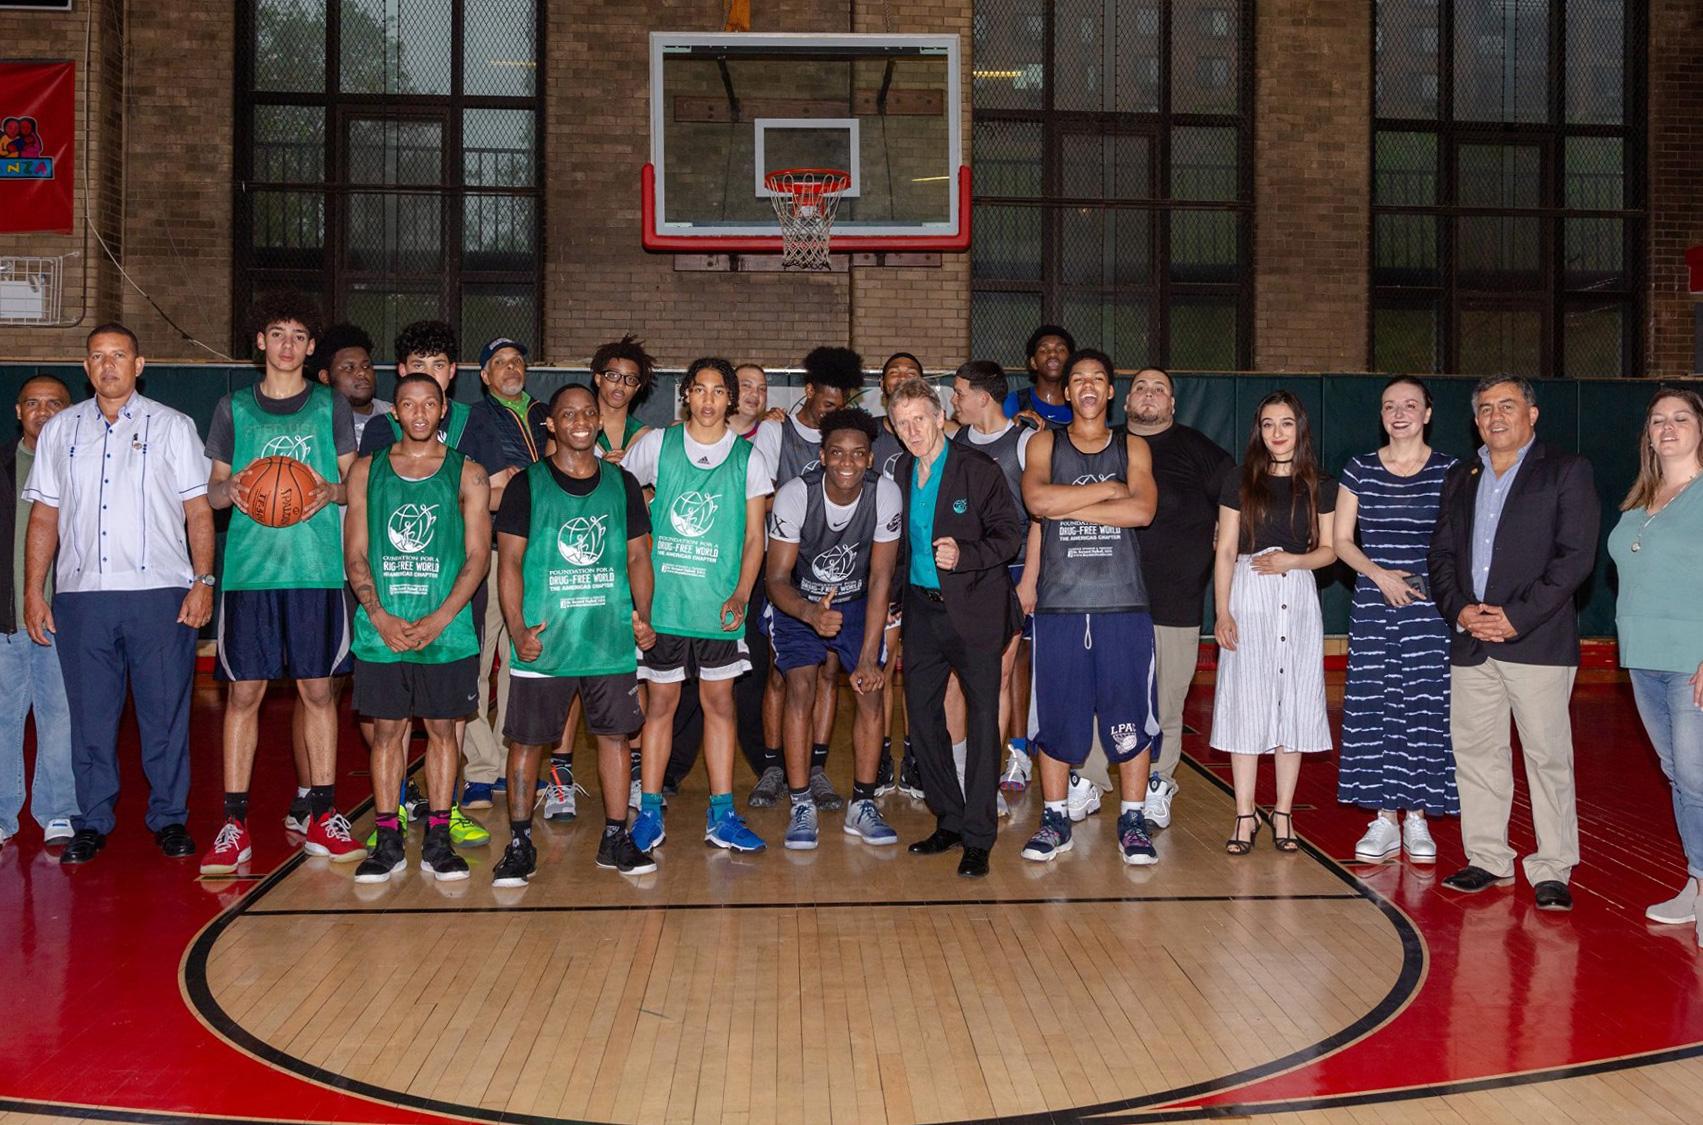 2nd-Annual-Drug-Free-Basketball-Tournament-08.jpg